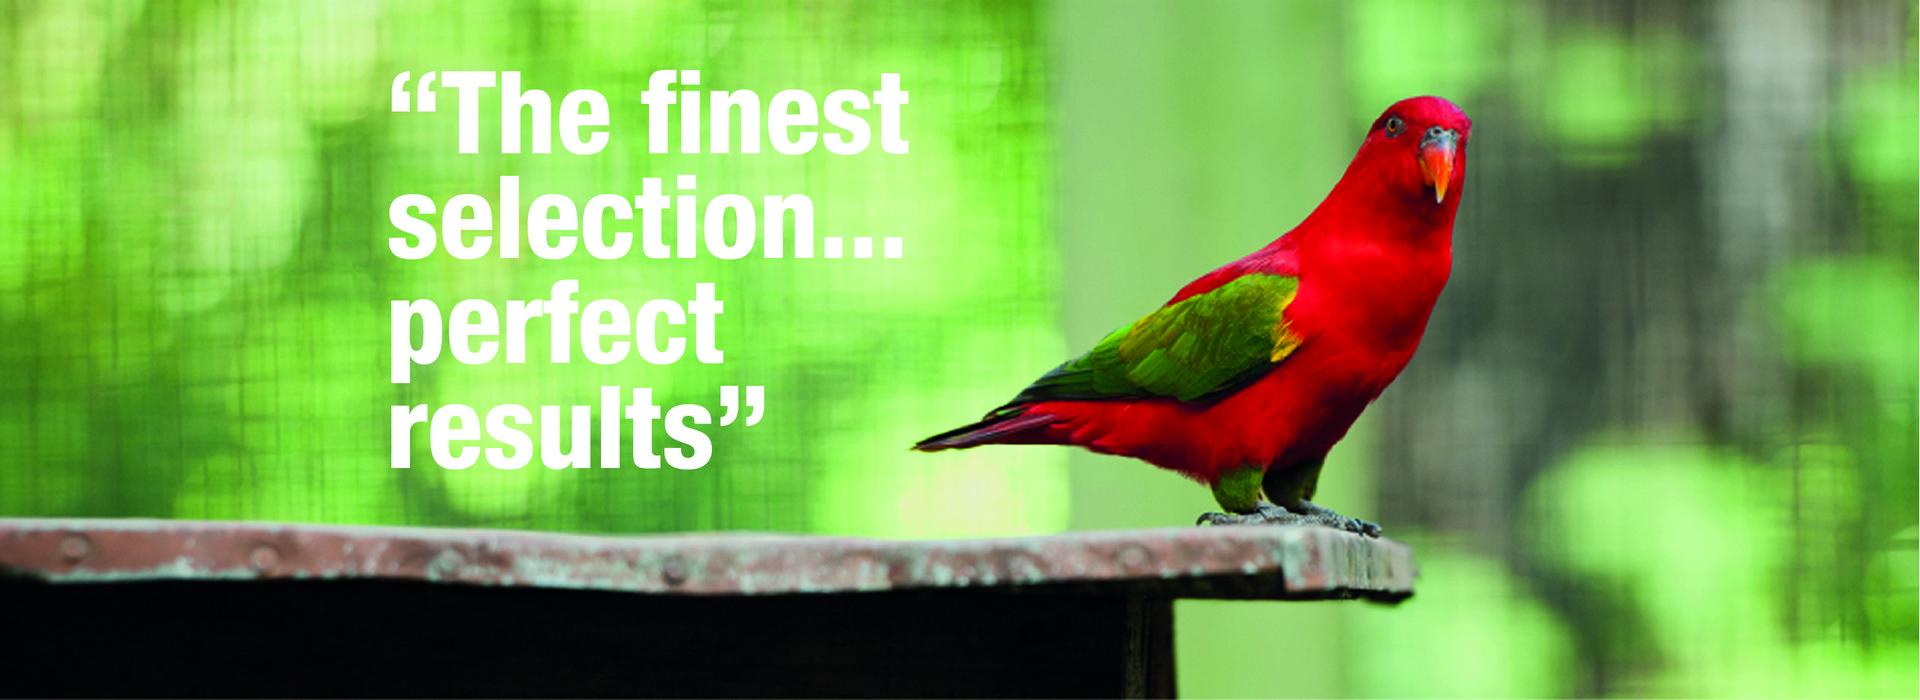 banner_birds_F